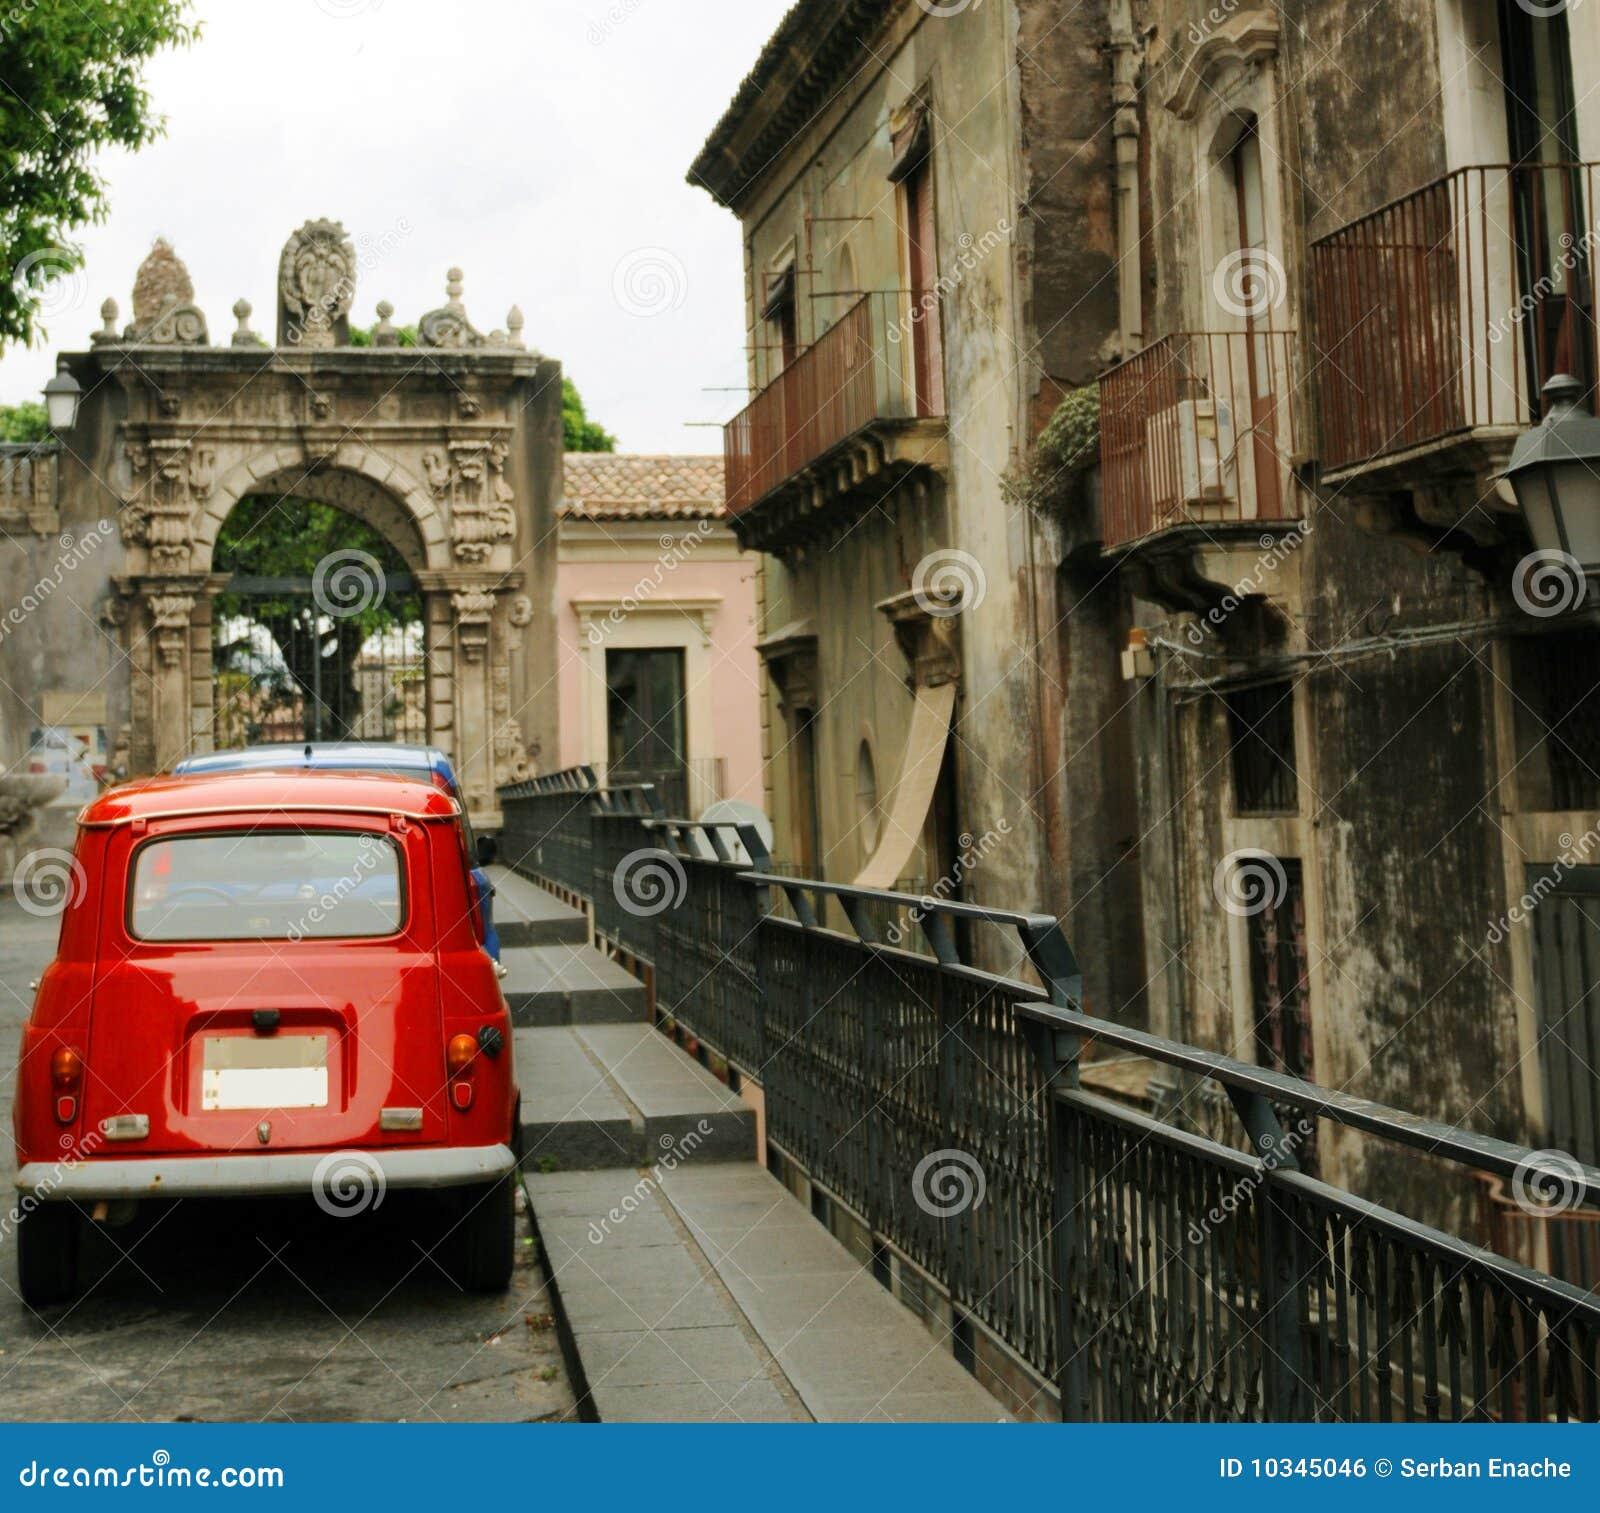 Catania street scene